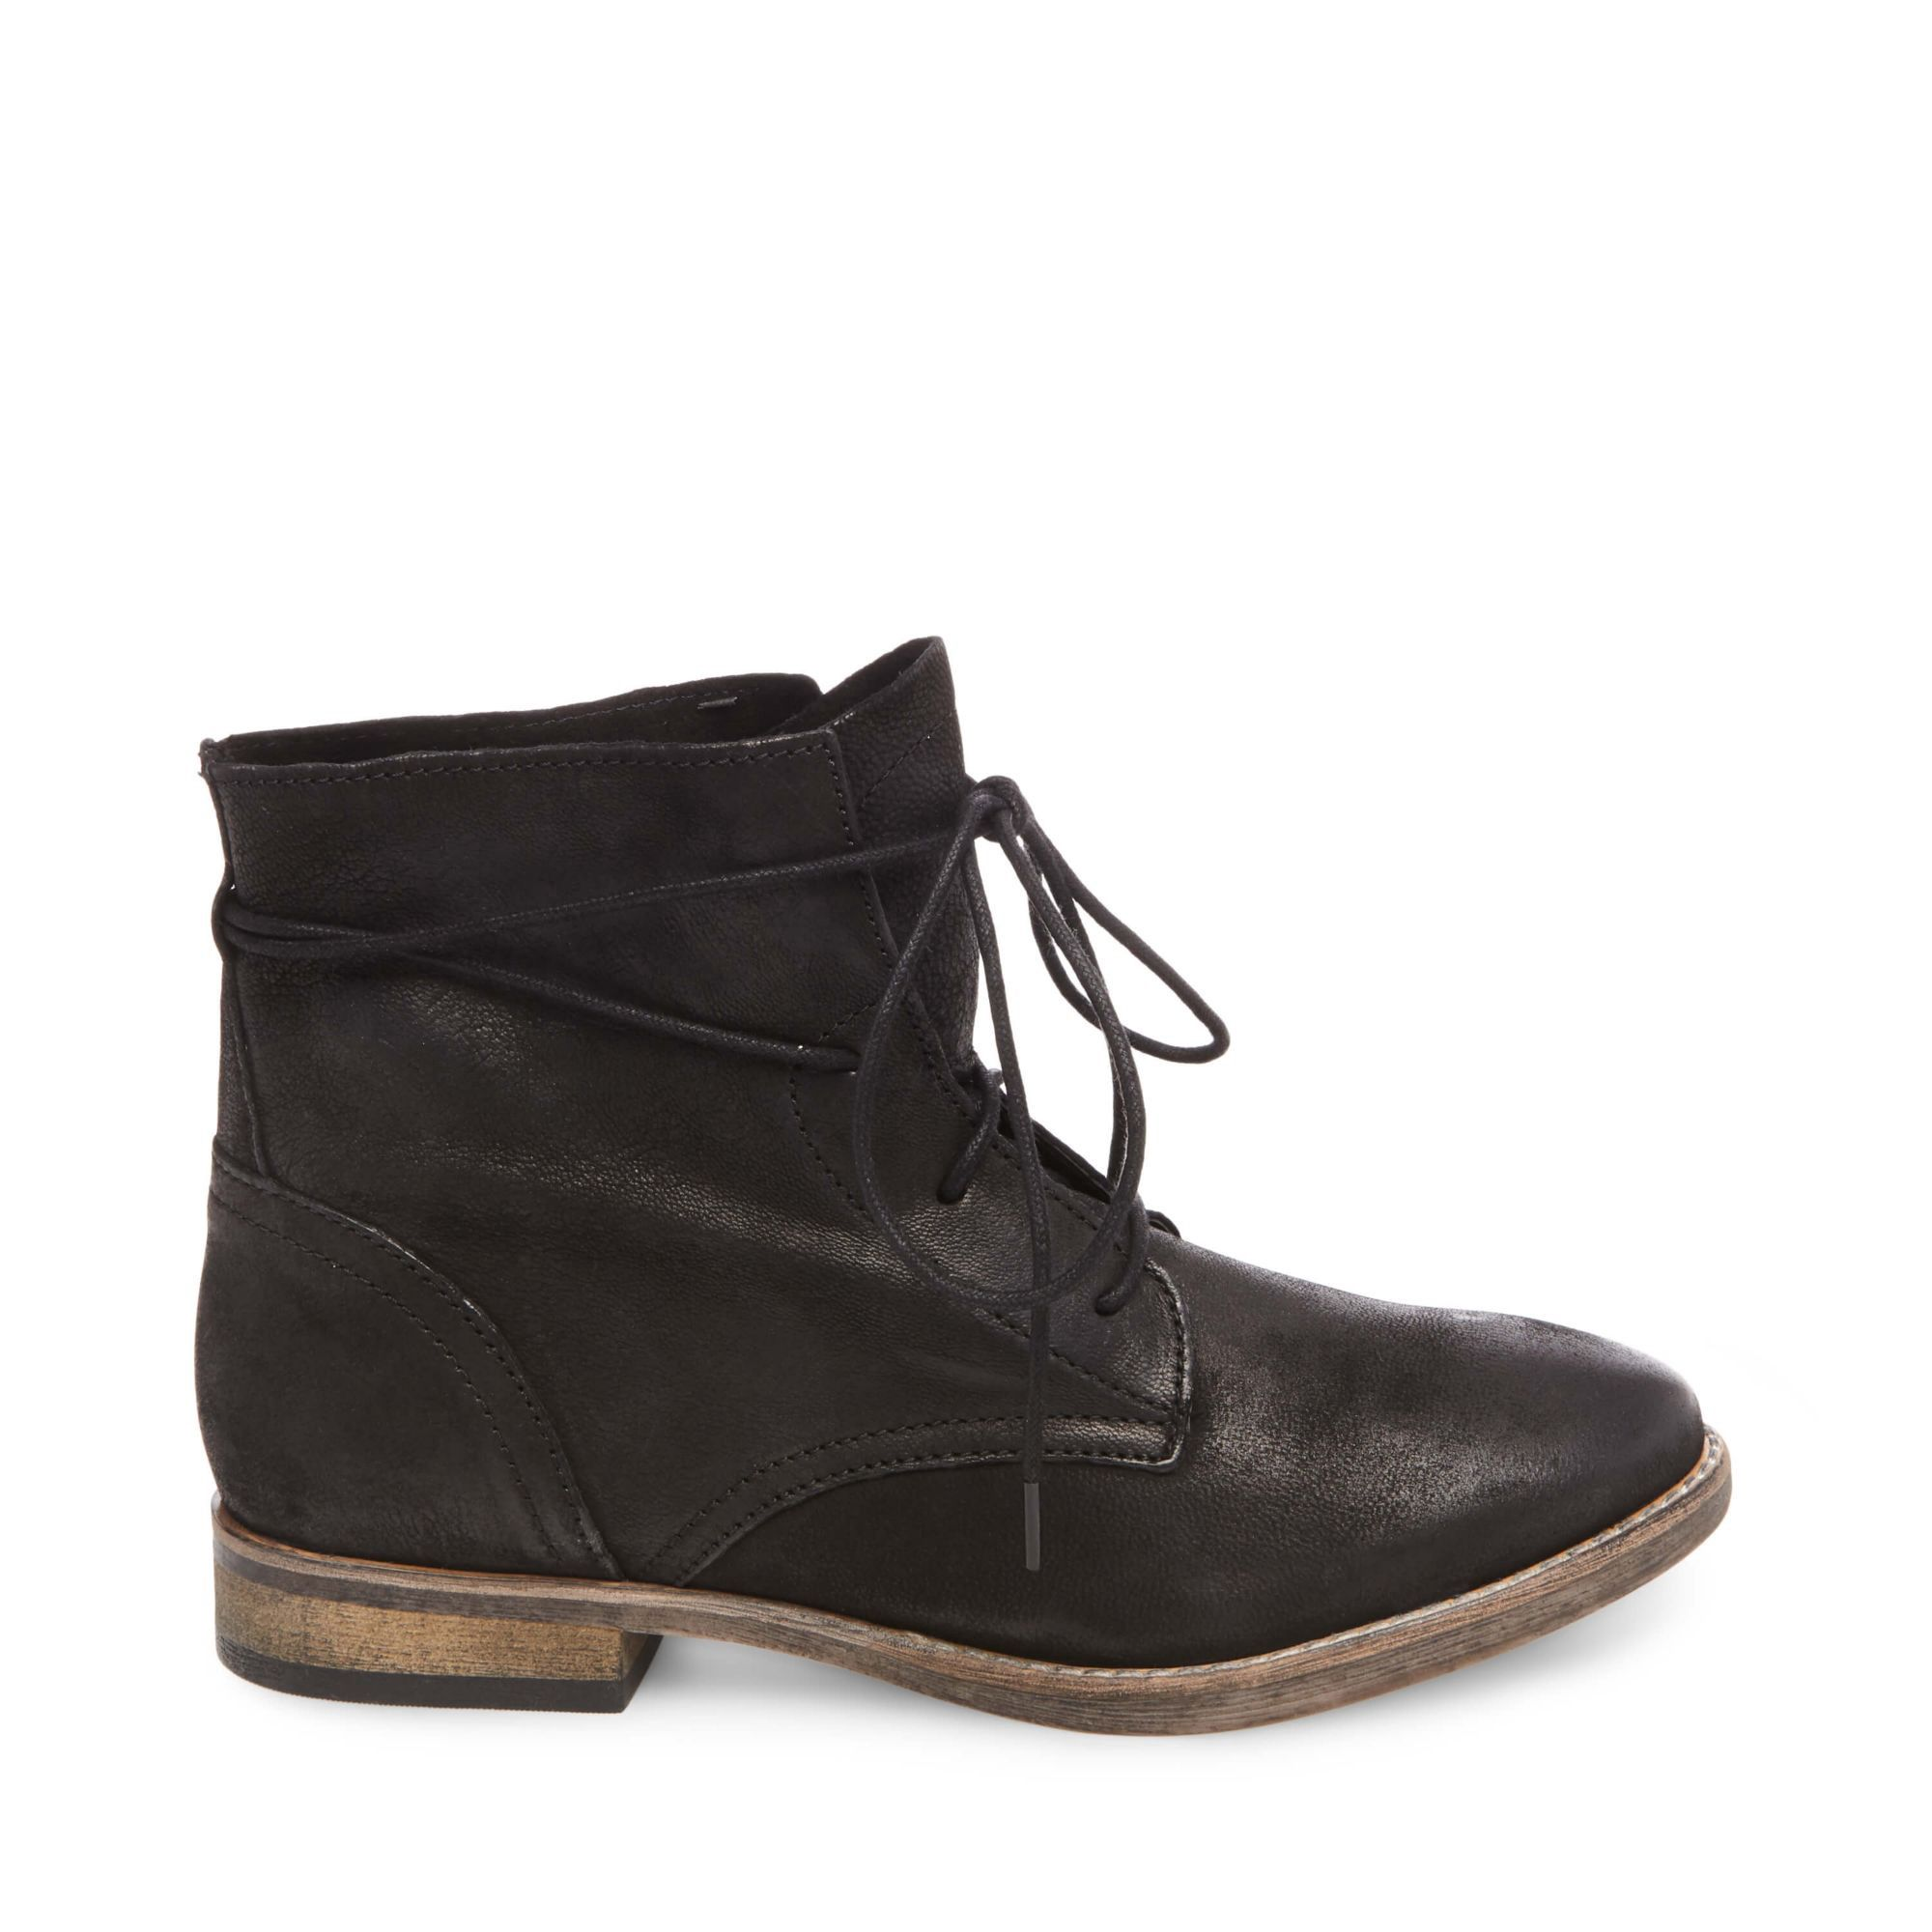 4081e9e10a6 STEVE MADDEN EUREKA.  stevemadden  shoes